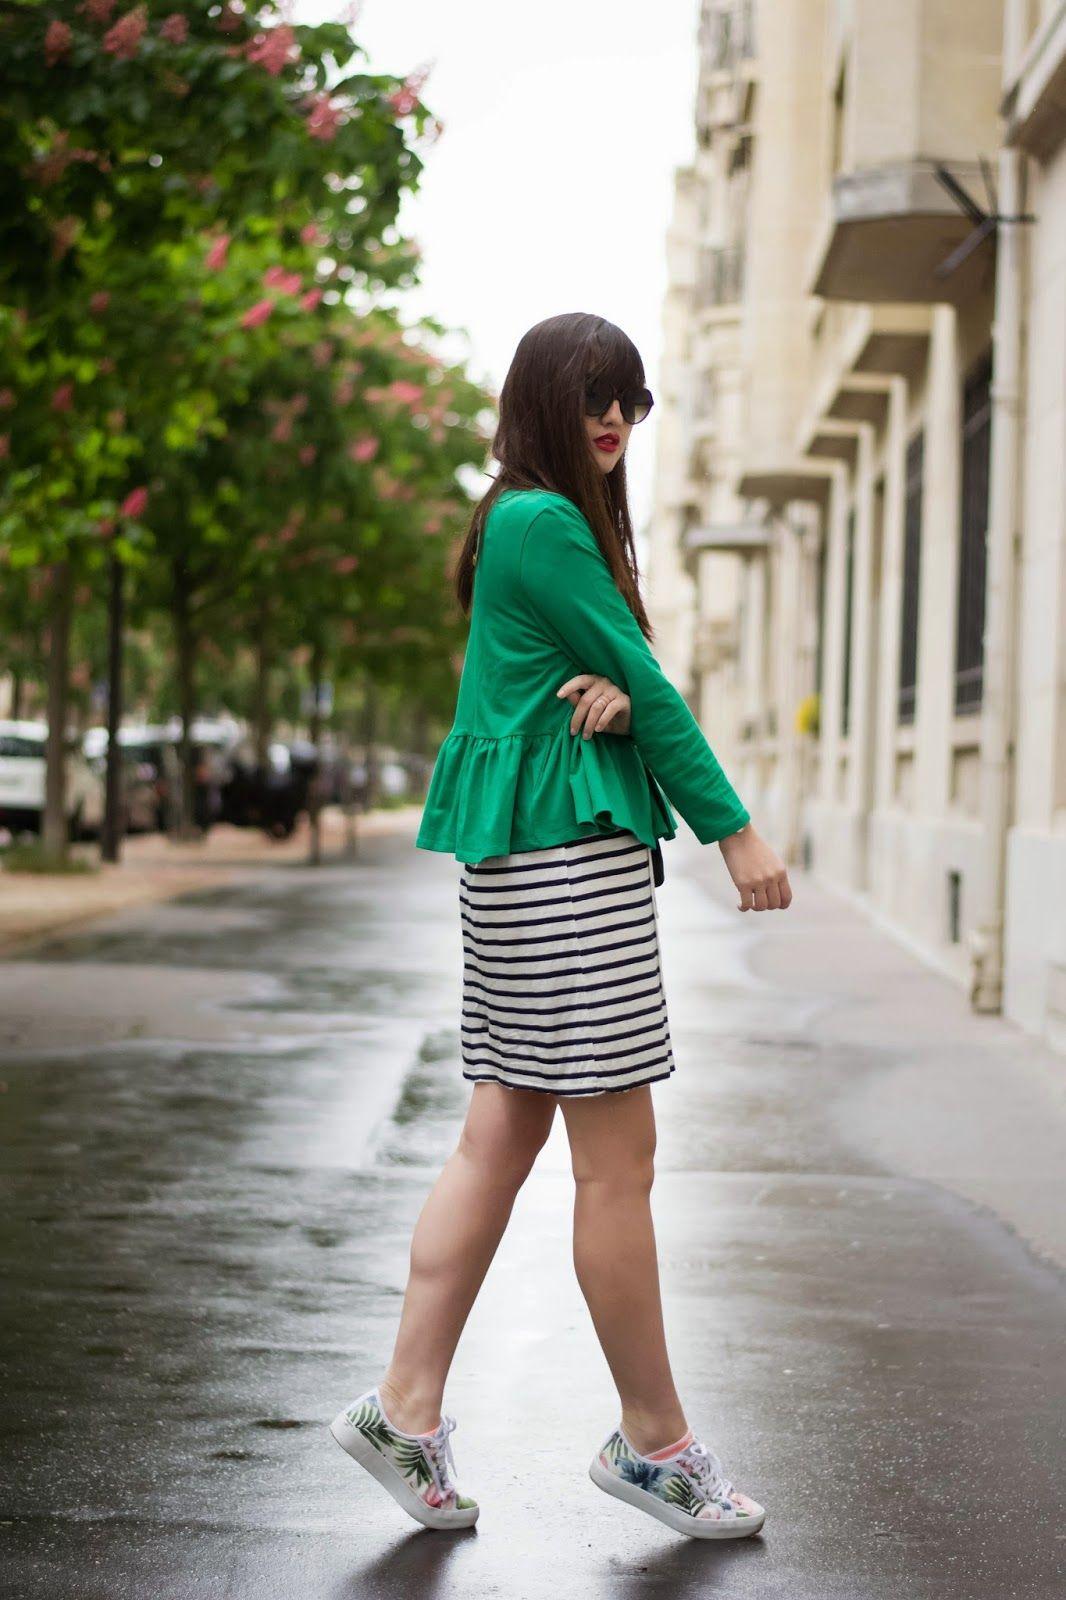 Womenwear blogger